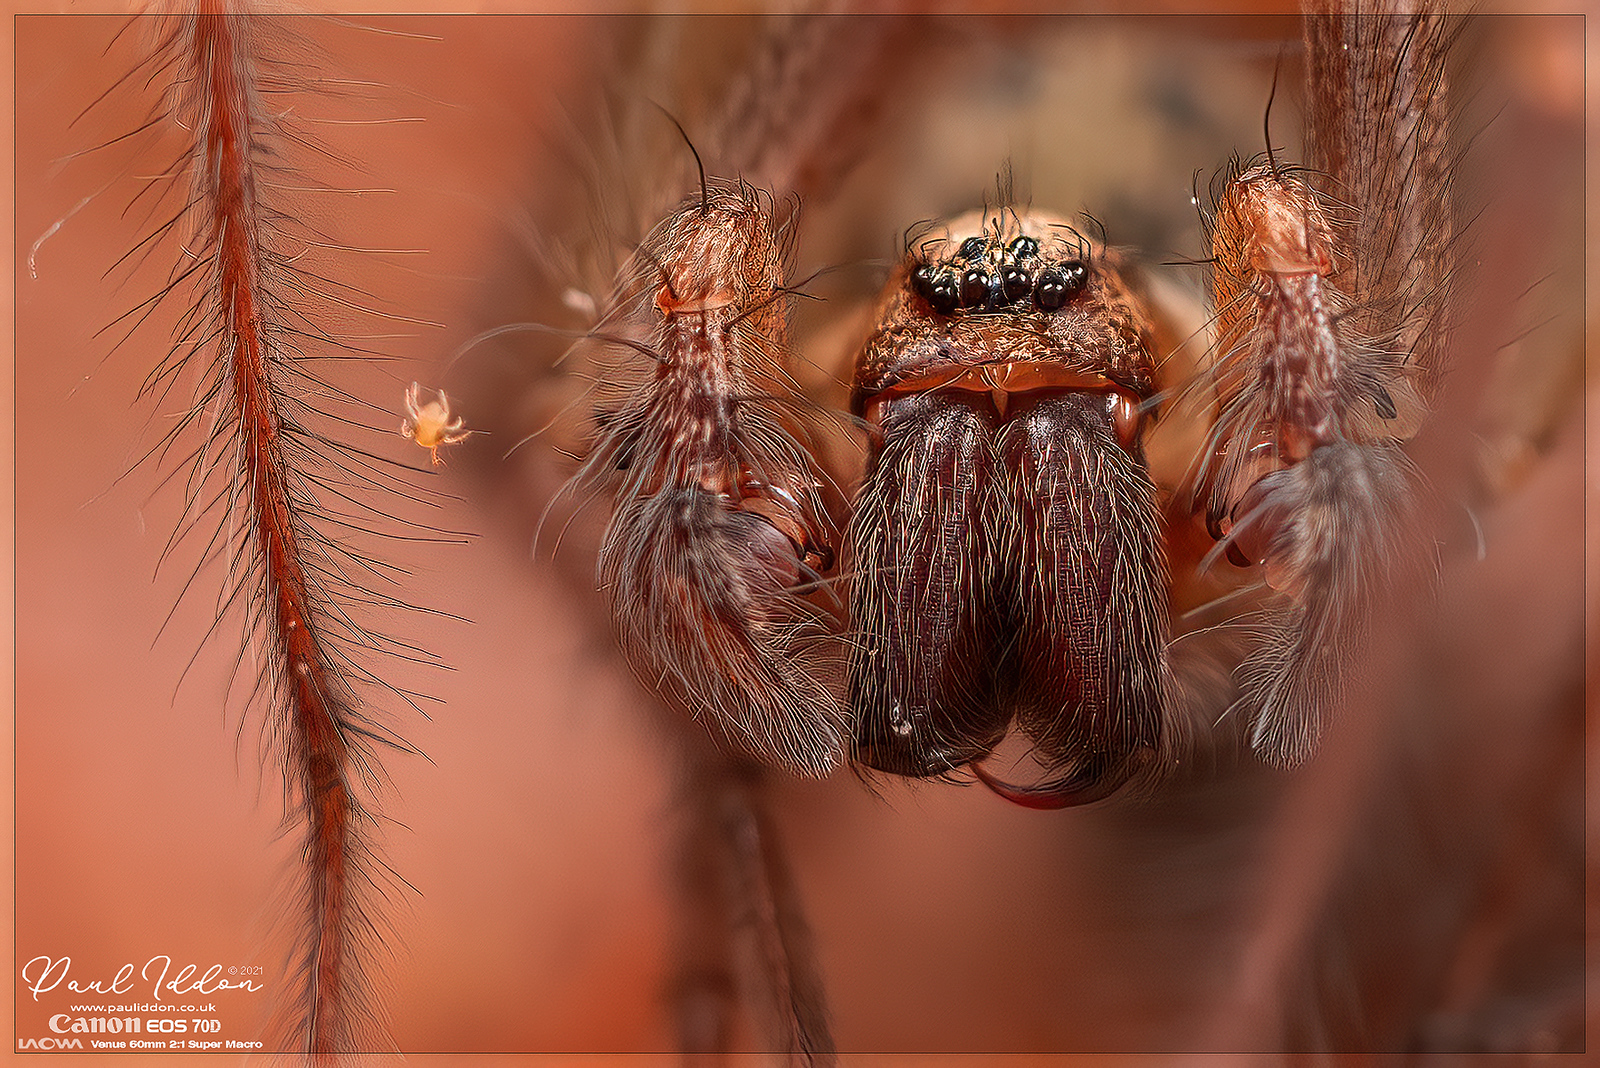 IMAGE: https://photos.smugmug.com/Macro-Gallery/i-955bhRk/0/d23d2ddc/X3/spiderlife3_4k_1800-X3.jpg